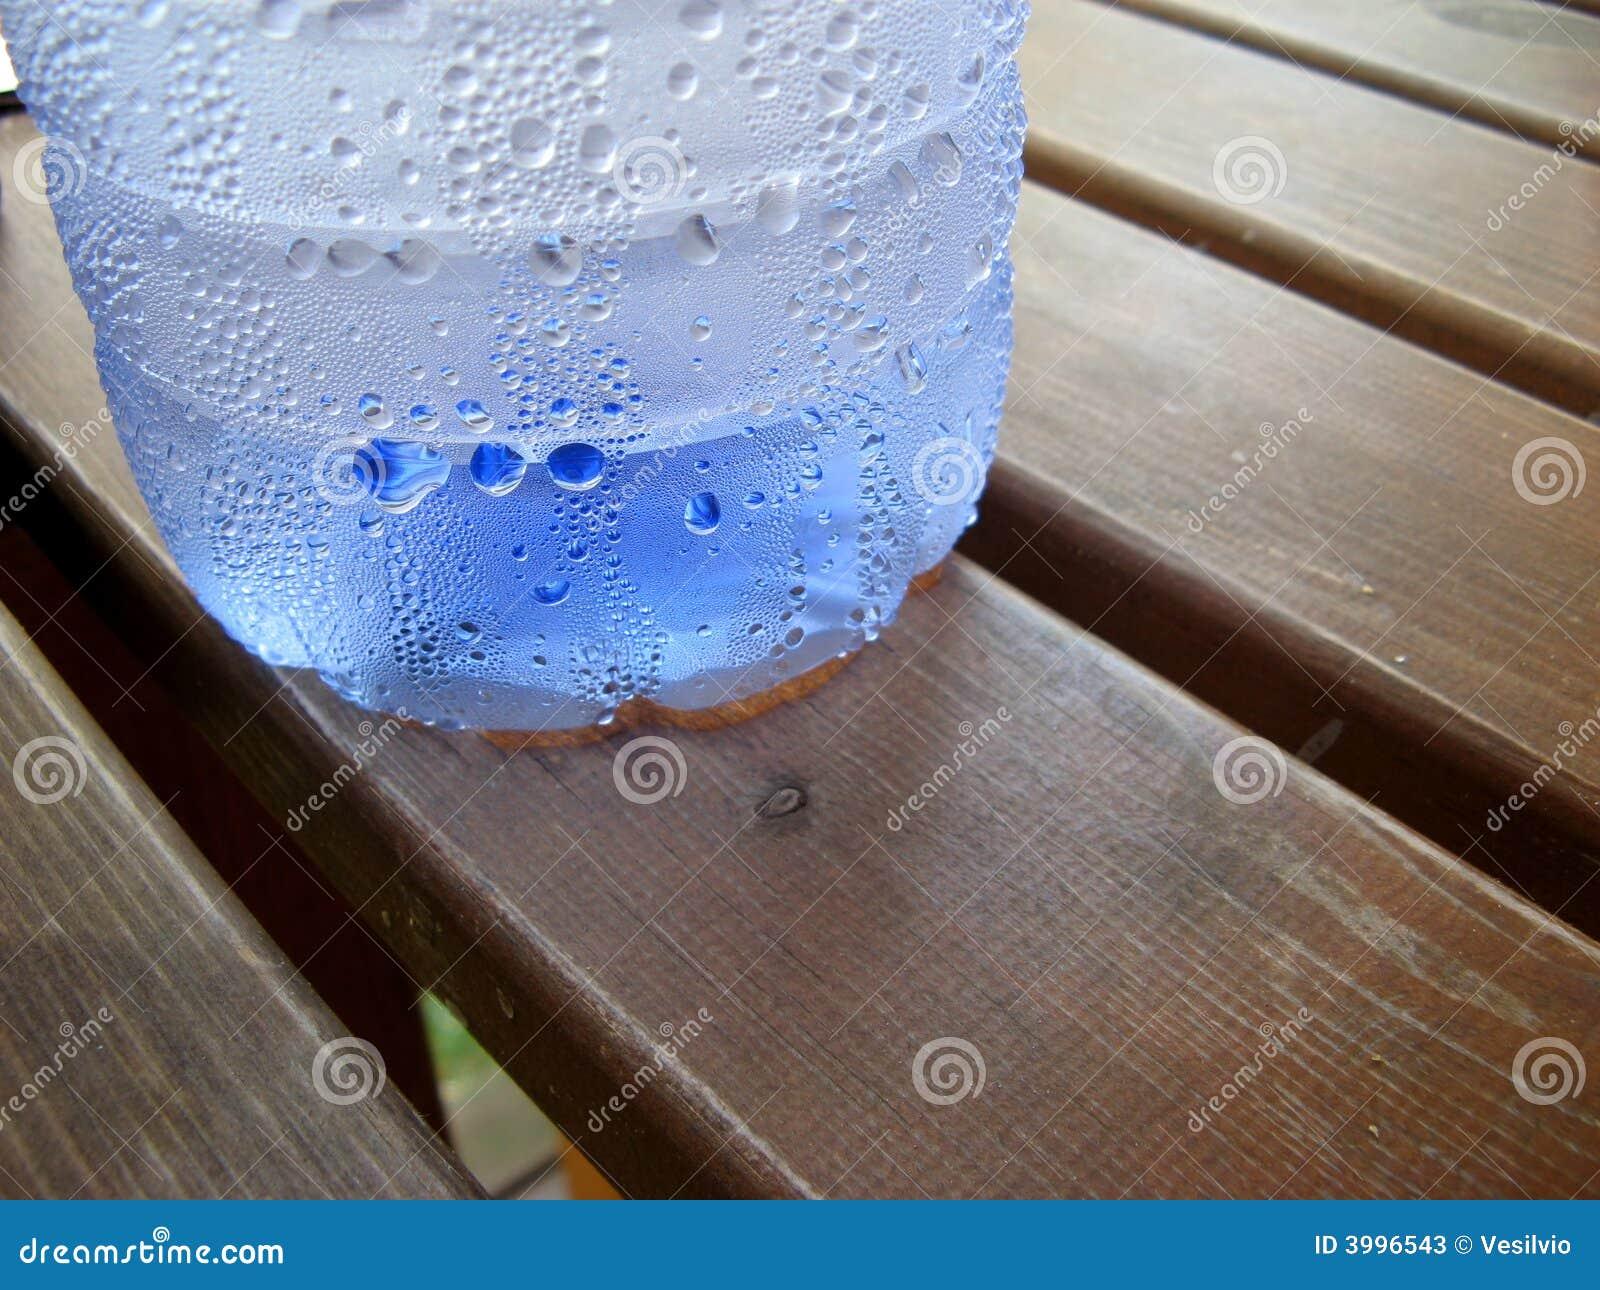 Refreshment